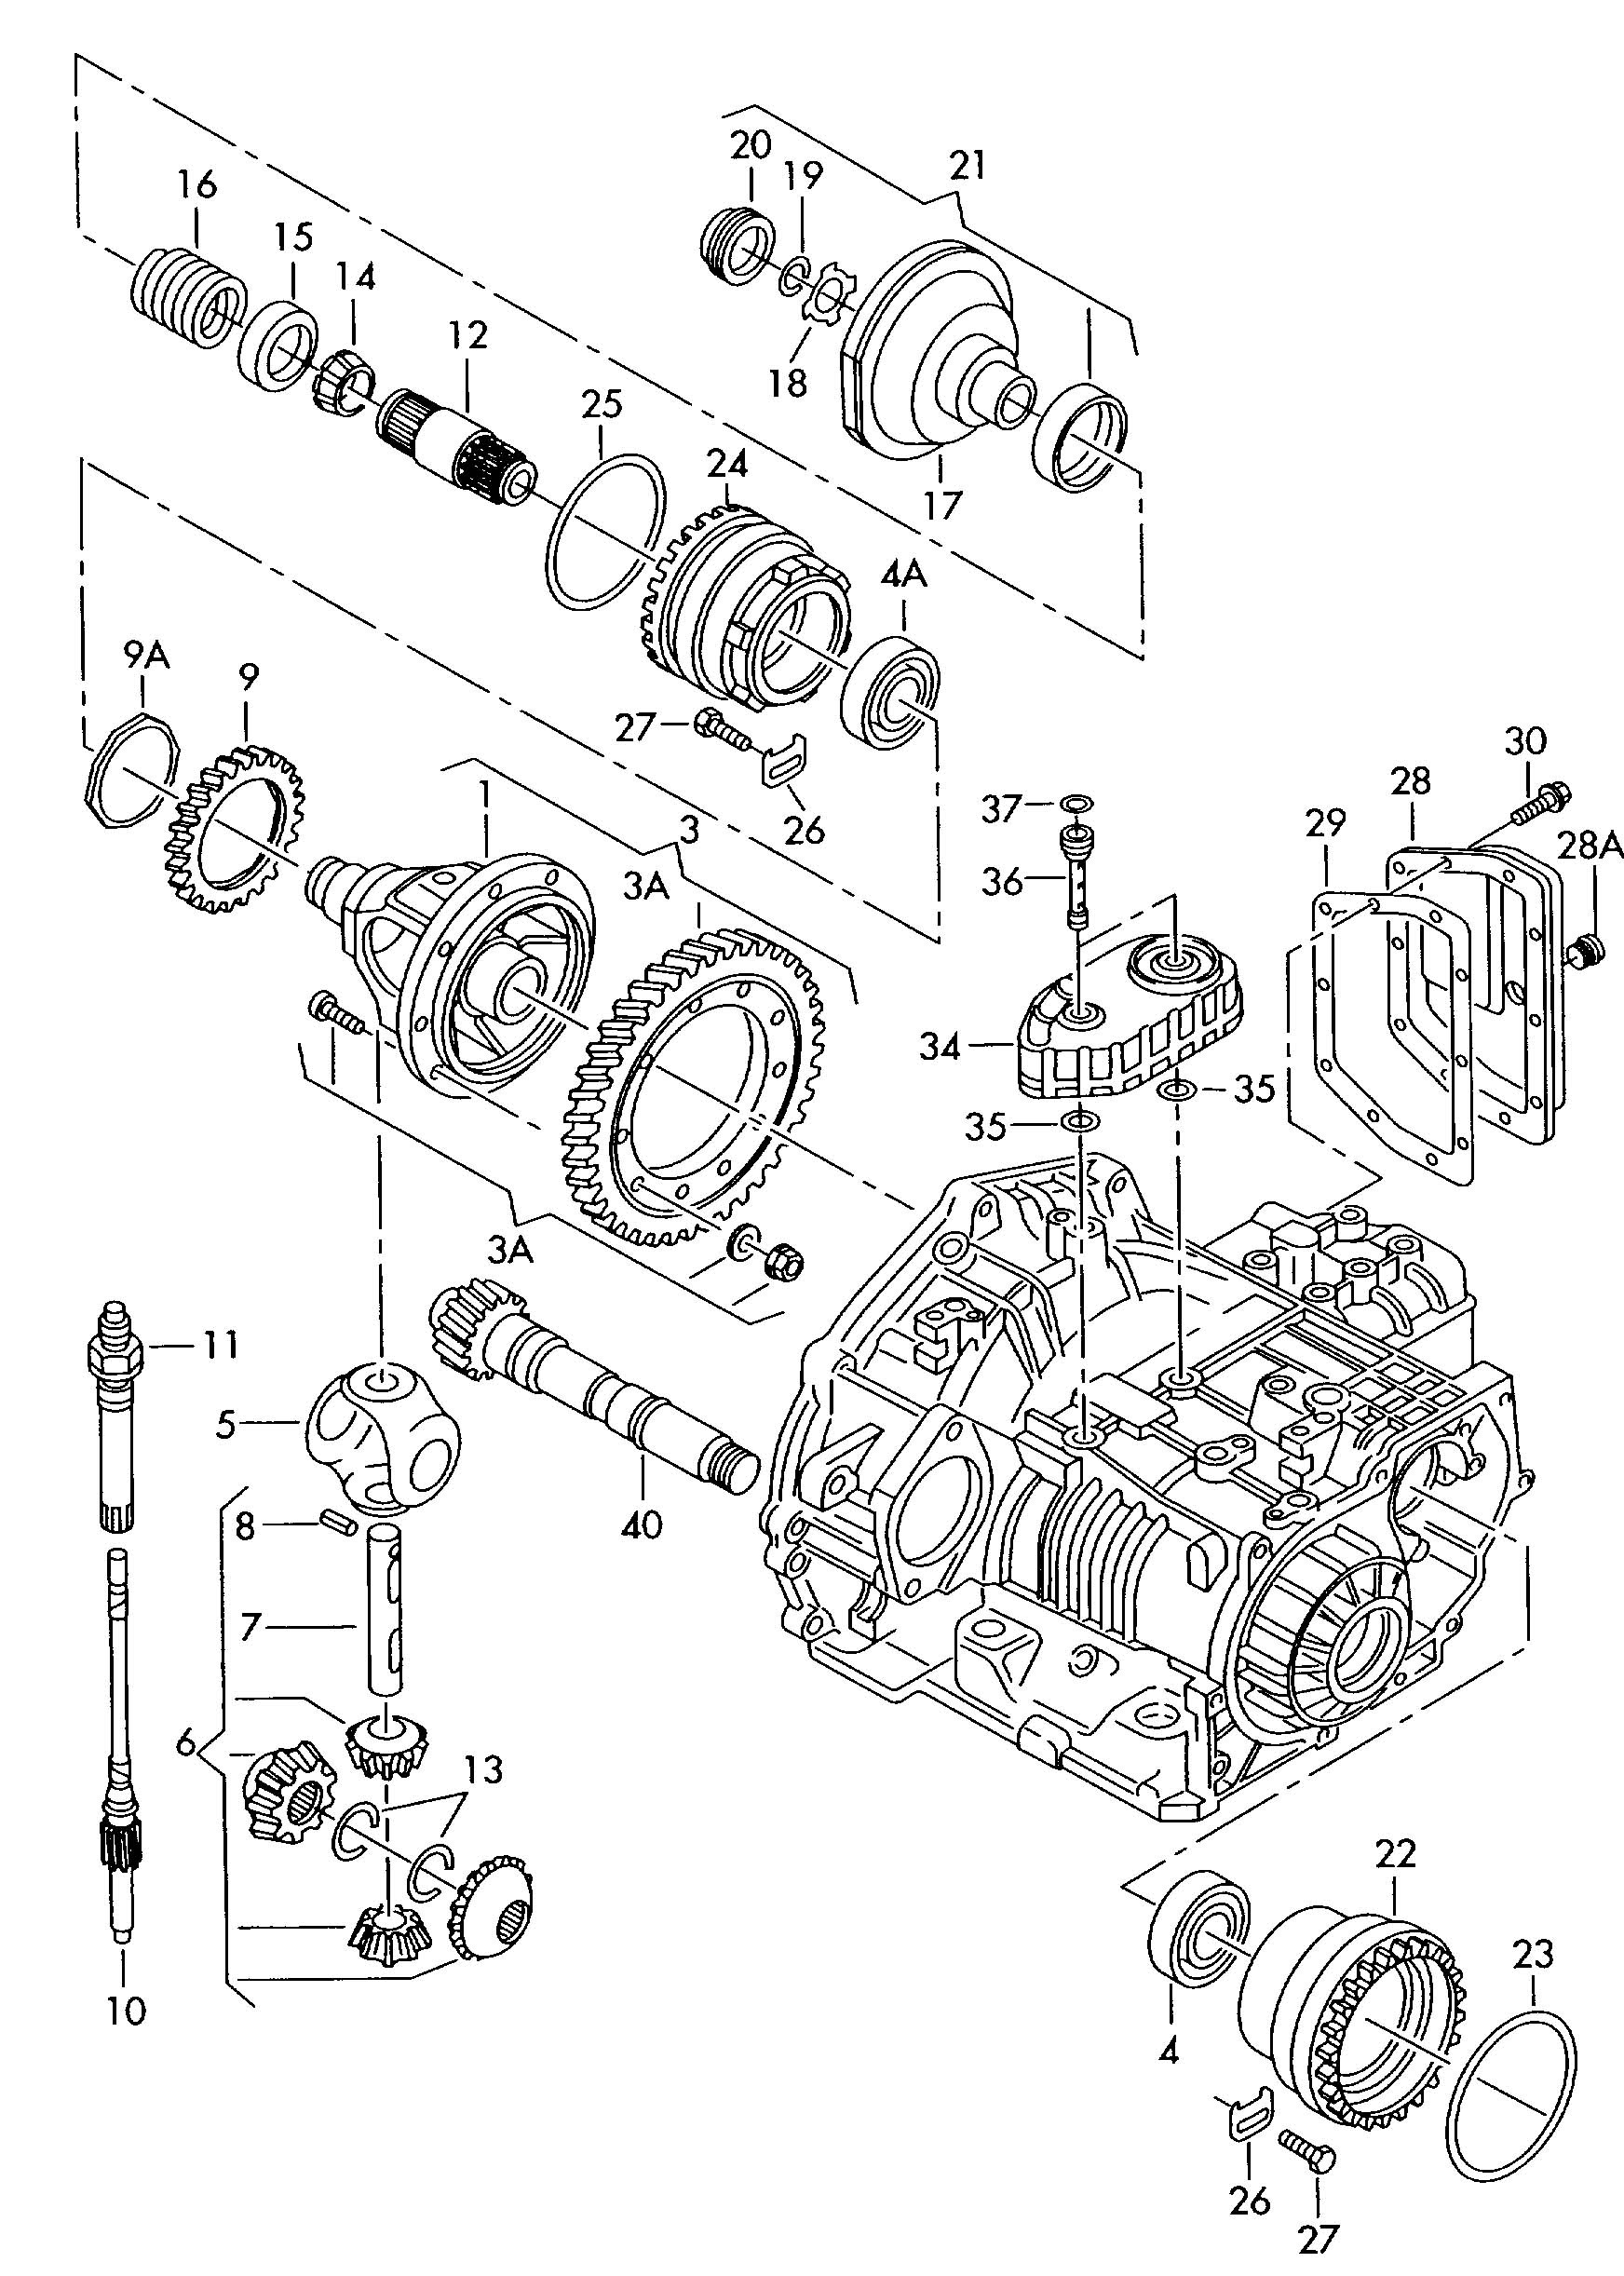 Diagram 07 Pontiac Vibe Fuse Diagram Full Version Hd Quality Fuse Diagram Acewiring19 Newsetvlucera It